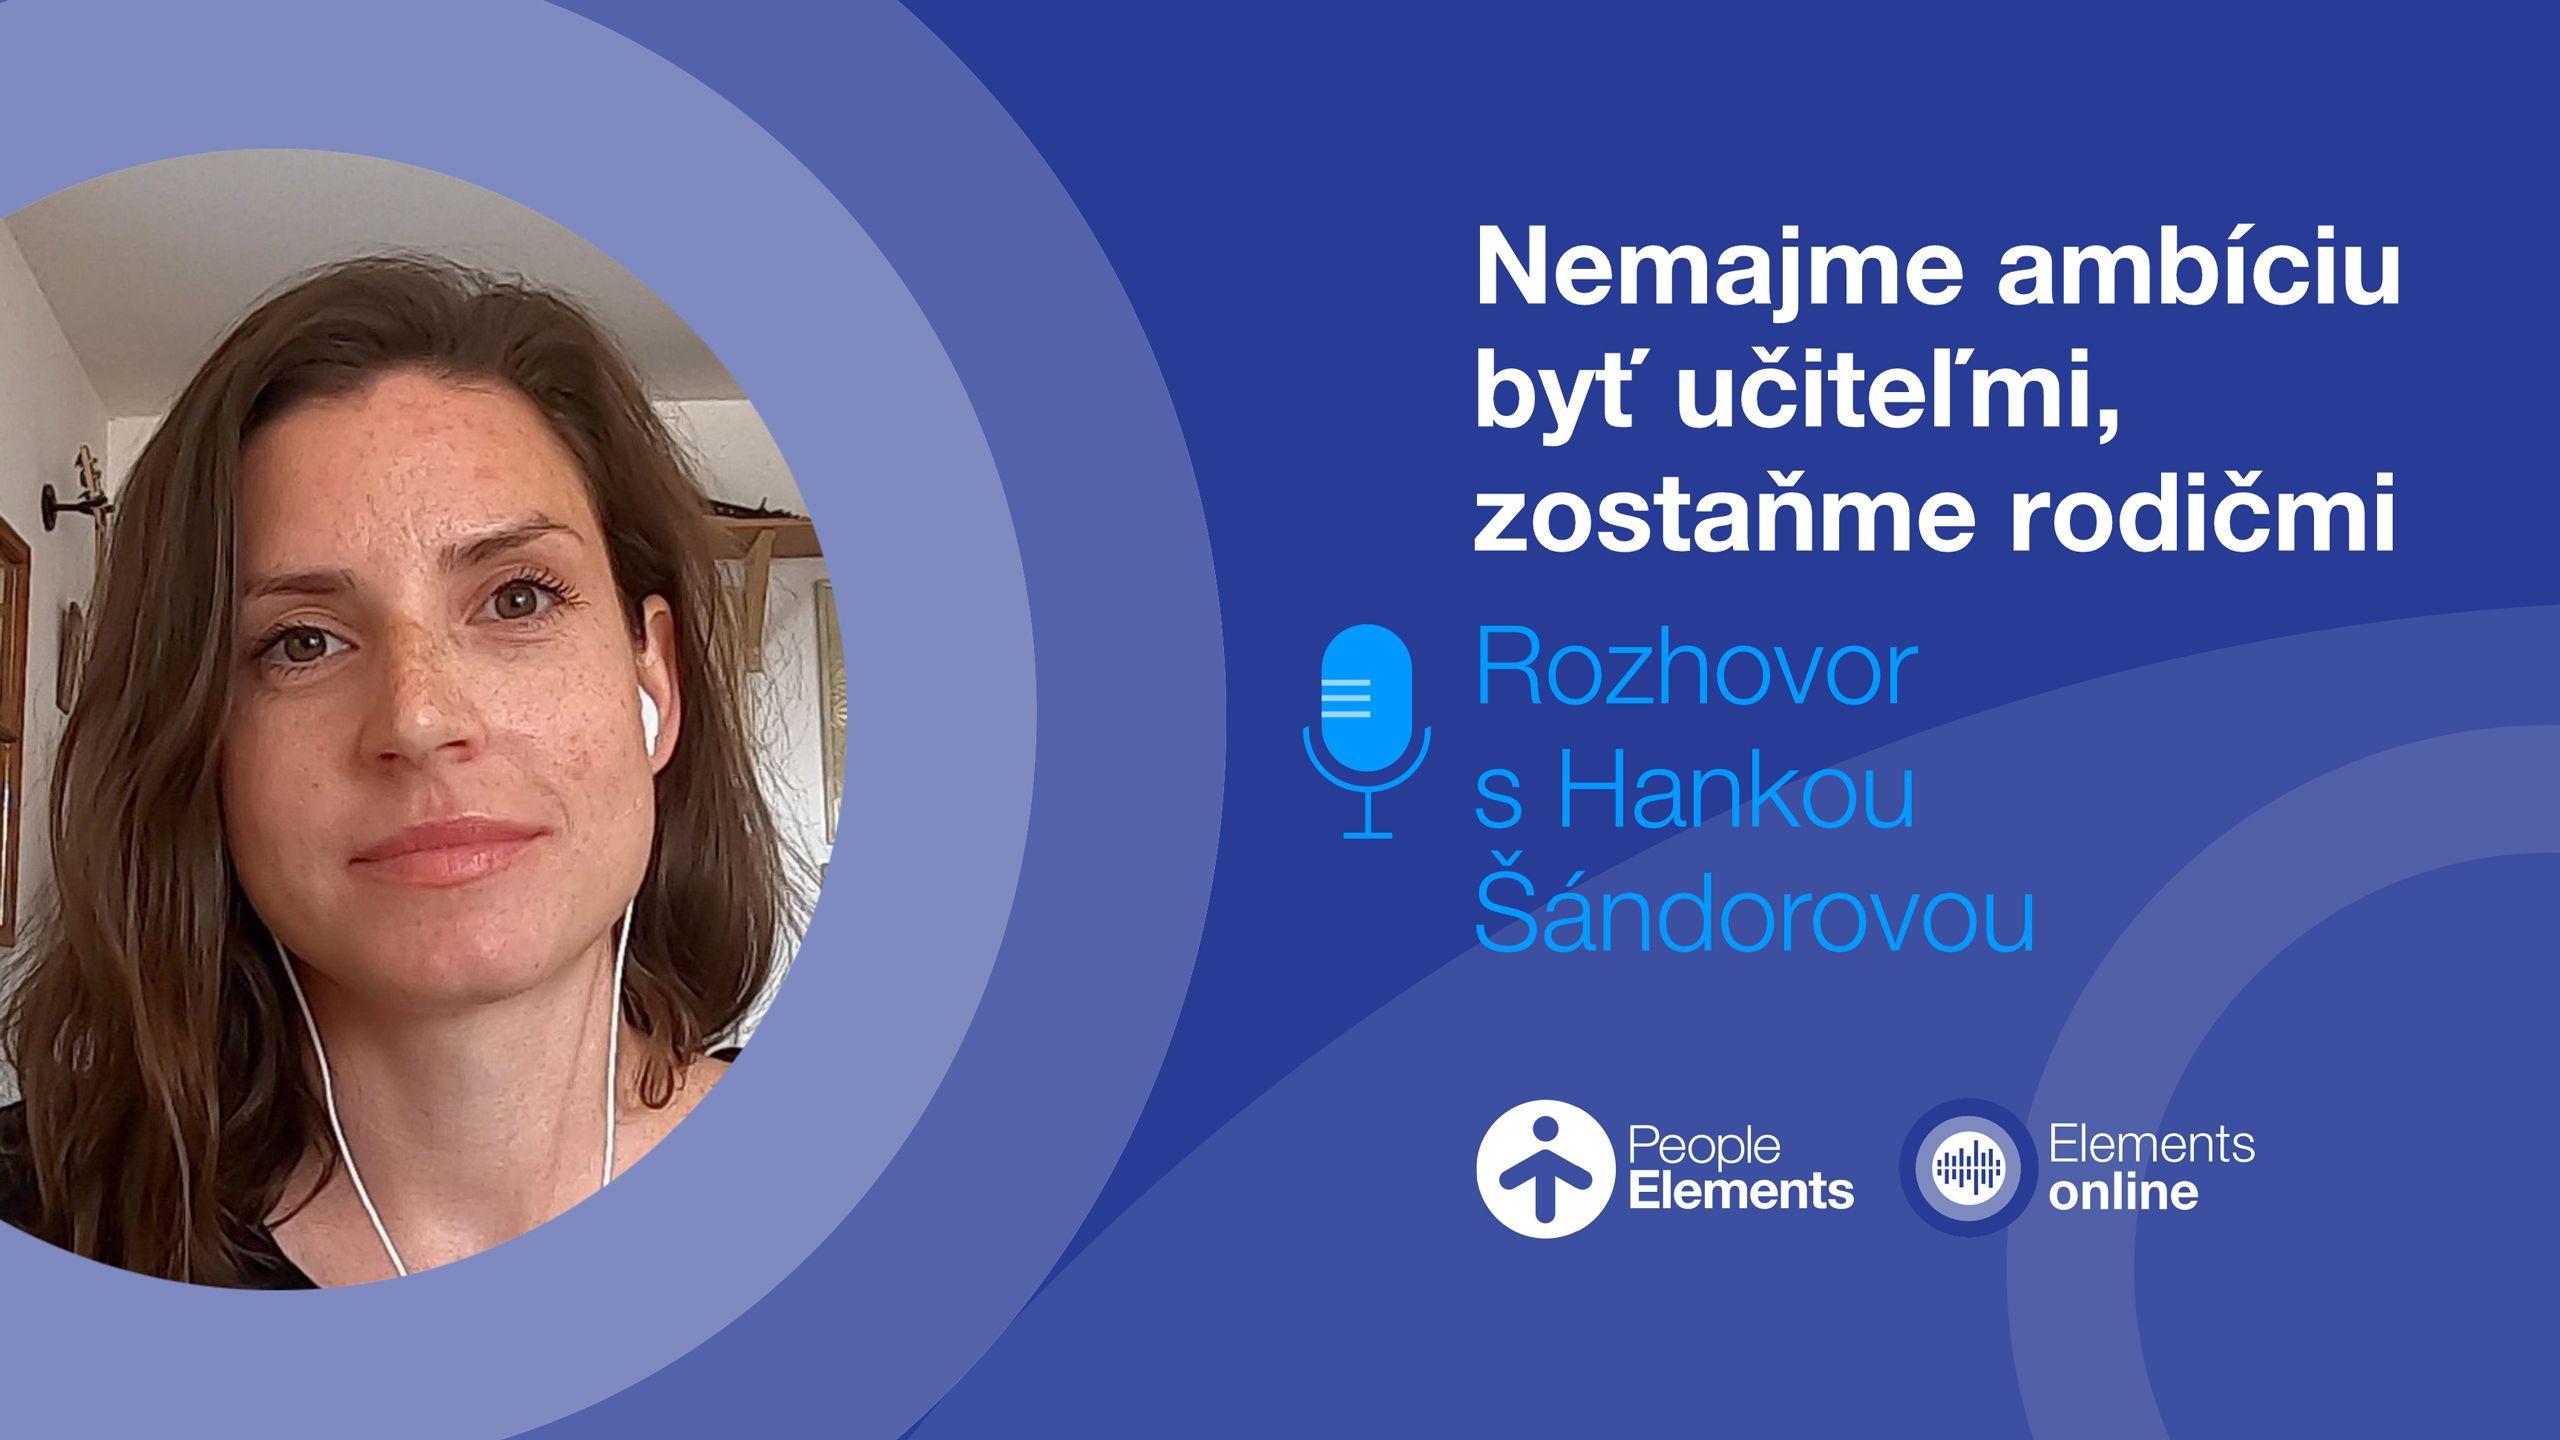 pe-banner-rozhovor-hanka-sandorova-2020-04-29-1920x1080@2x-c